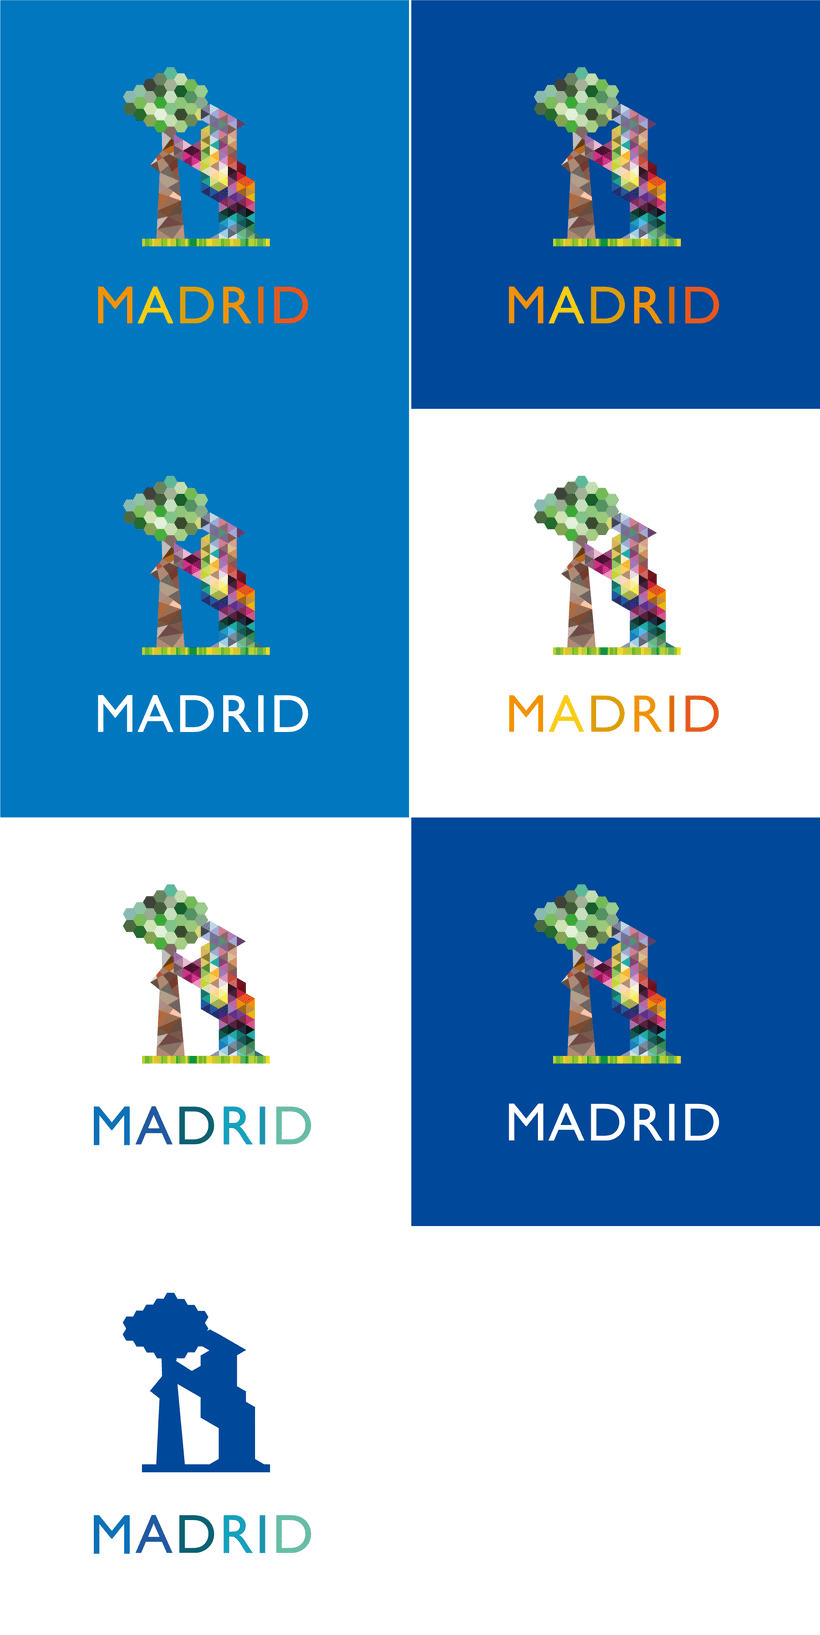 Branding Identity - Madrid 1